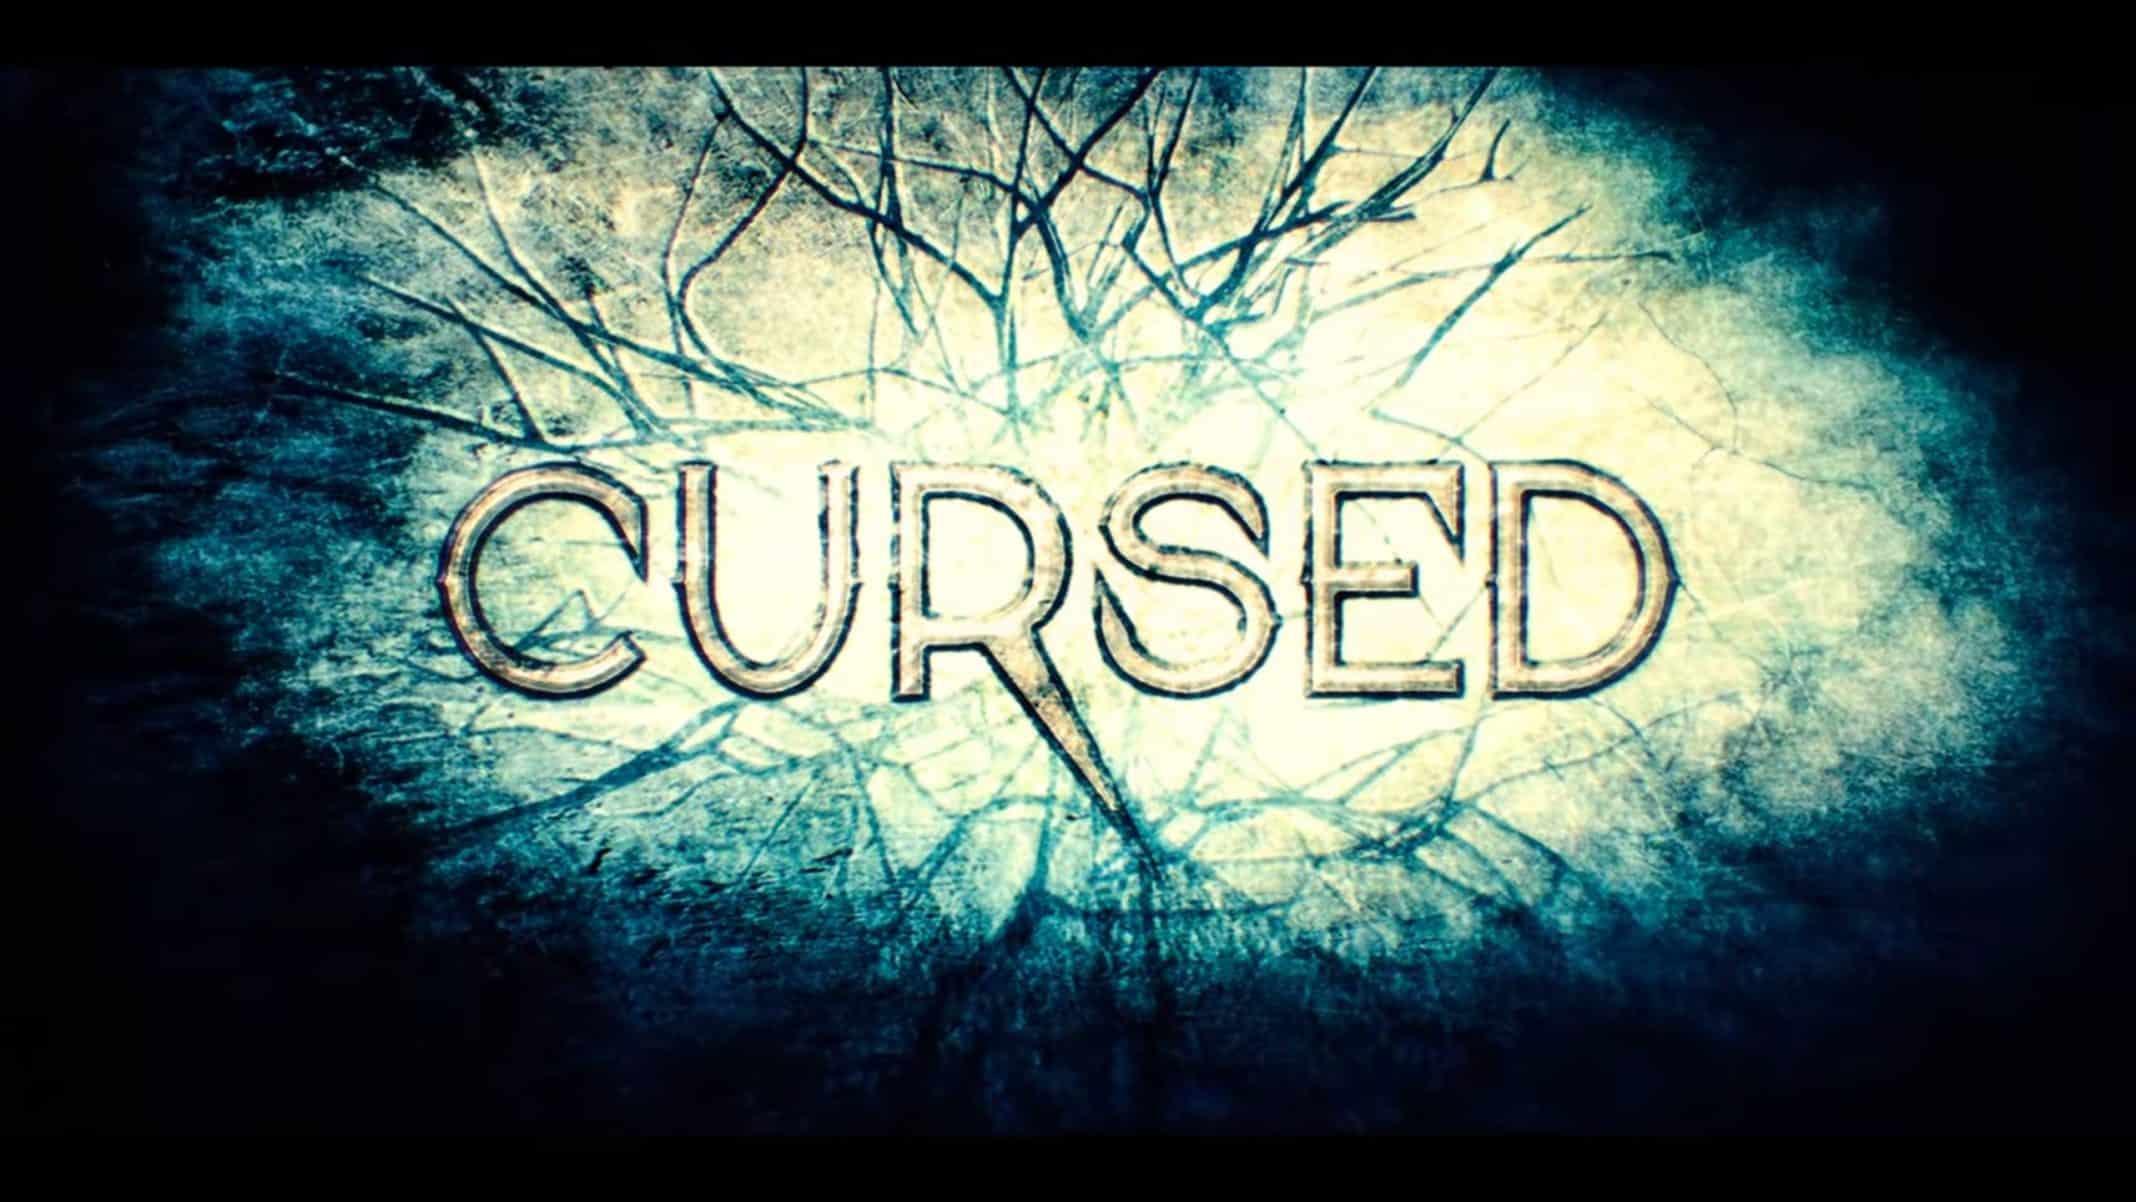 Title Card - Cursed